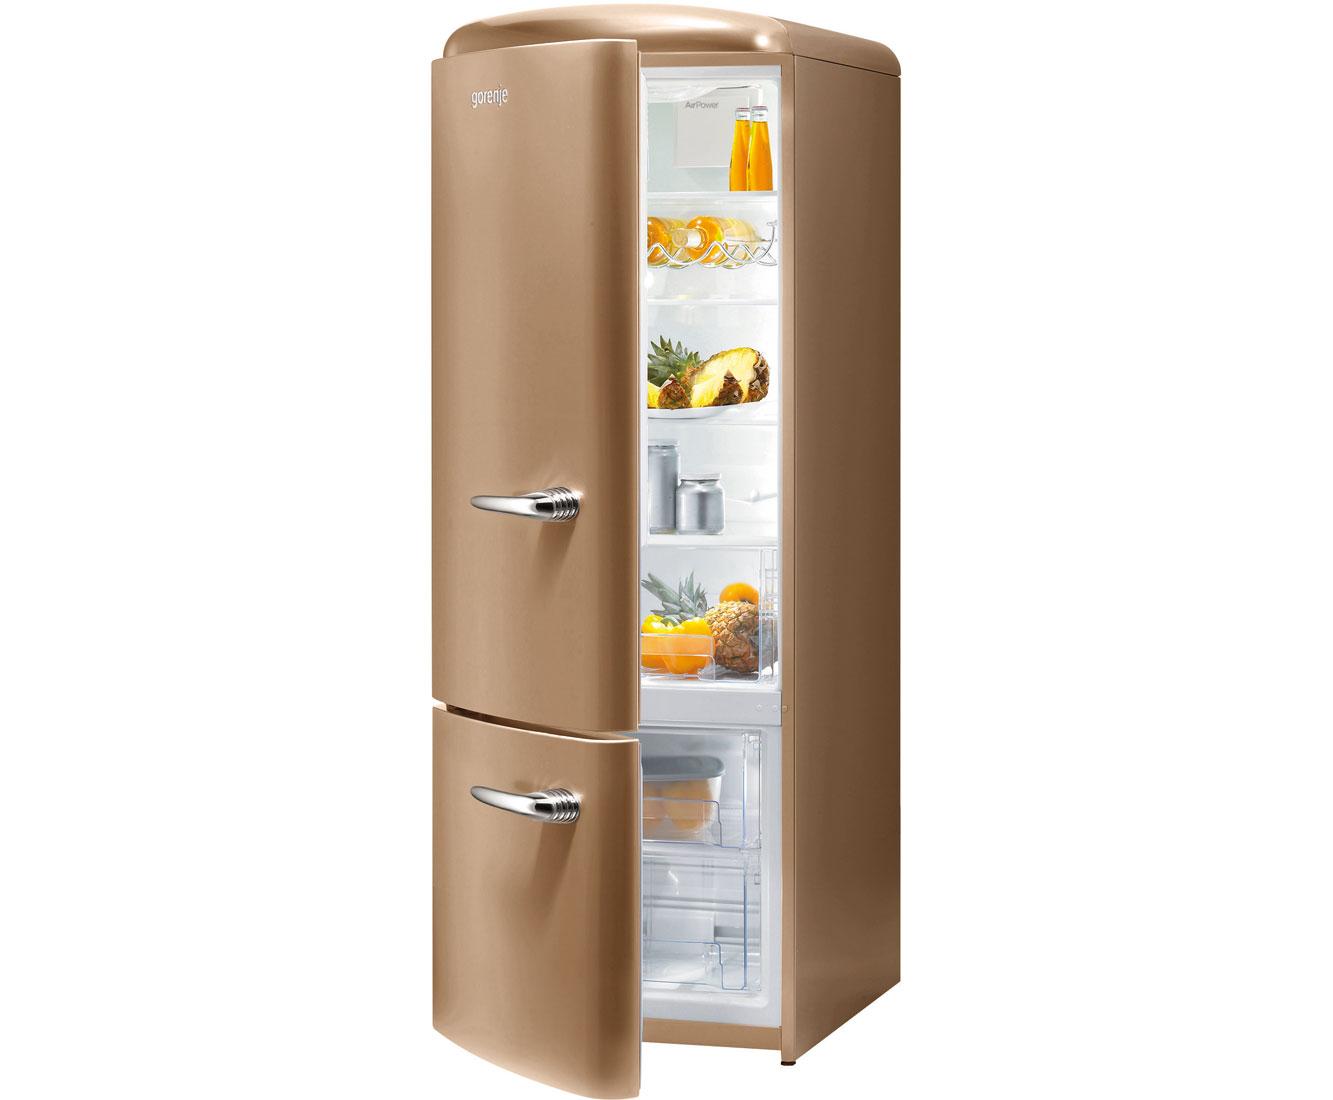 Gorenje Kühlschrank Kombi : Gorenje rk 60319 oco l kühl gefrierkombination 60er breite